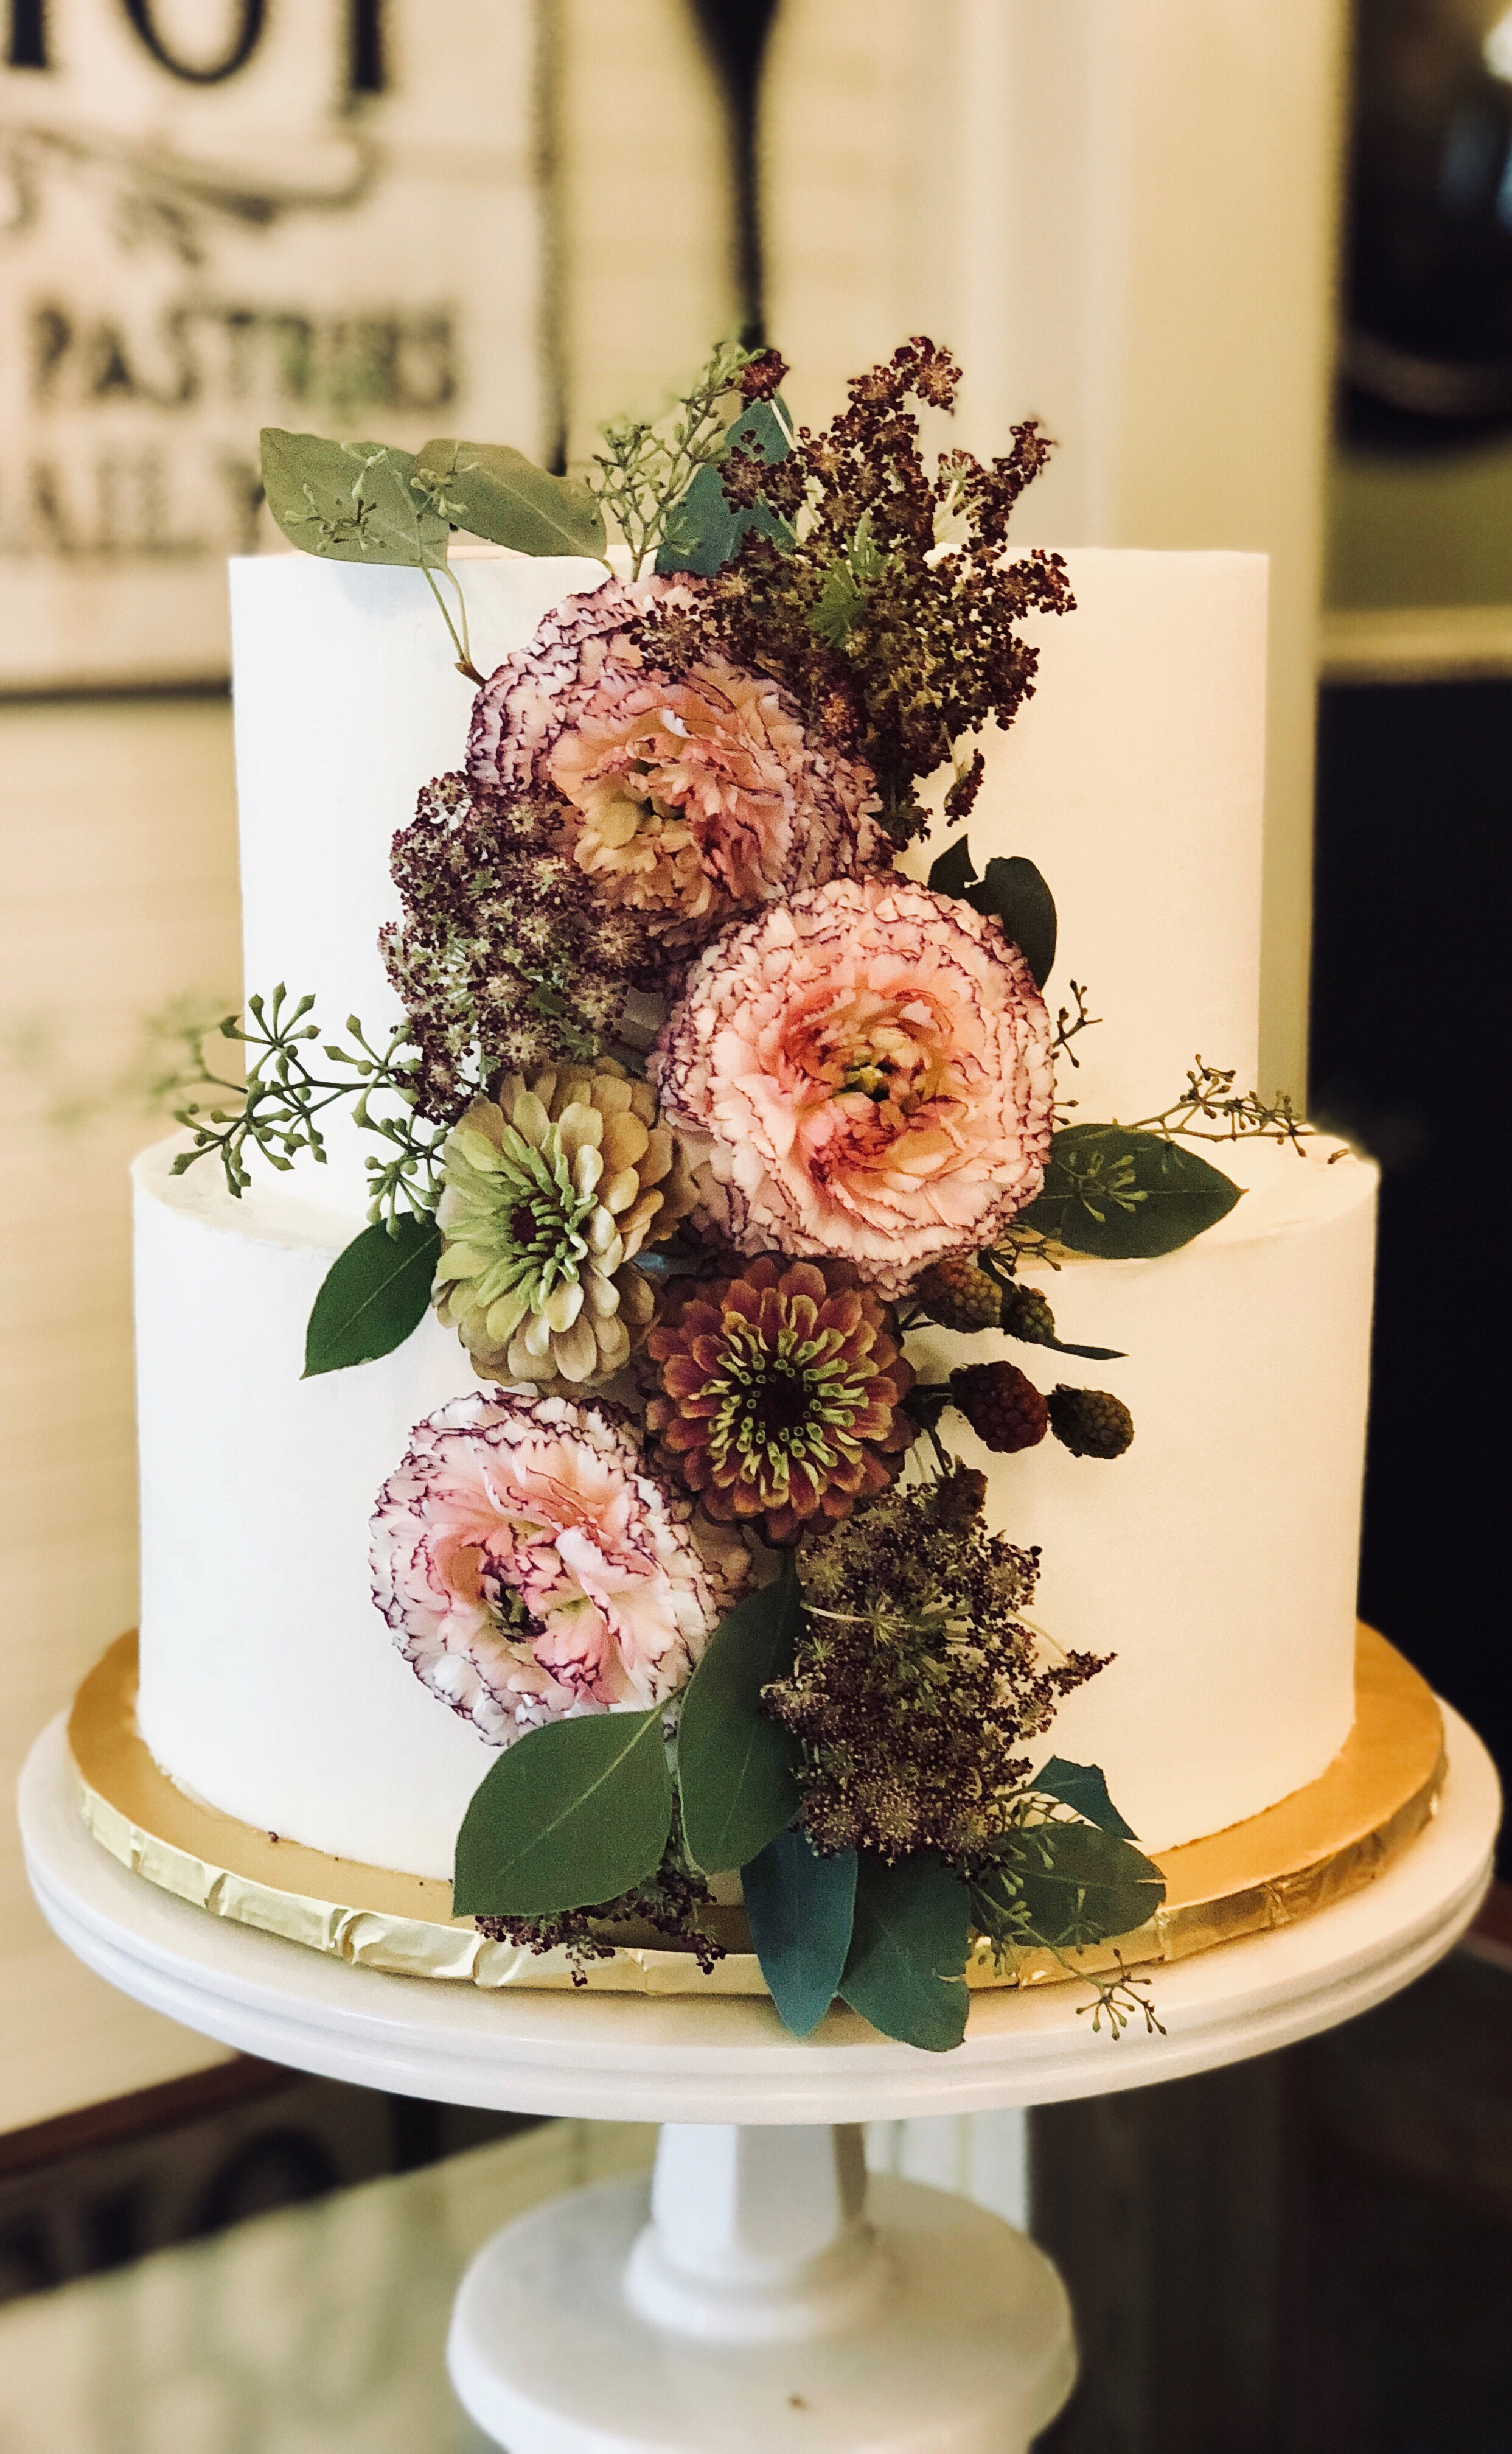 floral cake3.JPG